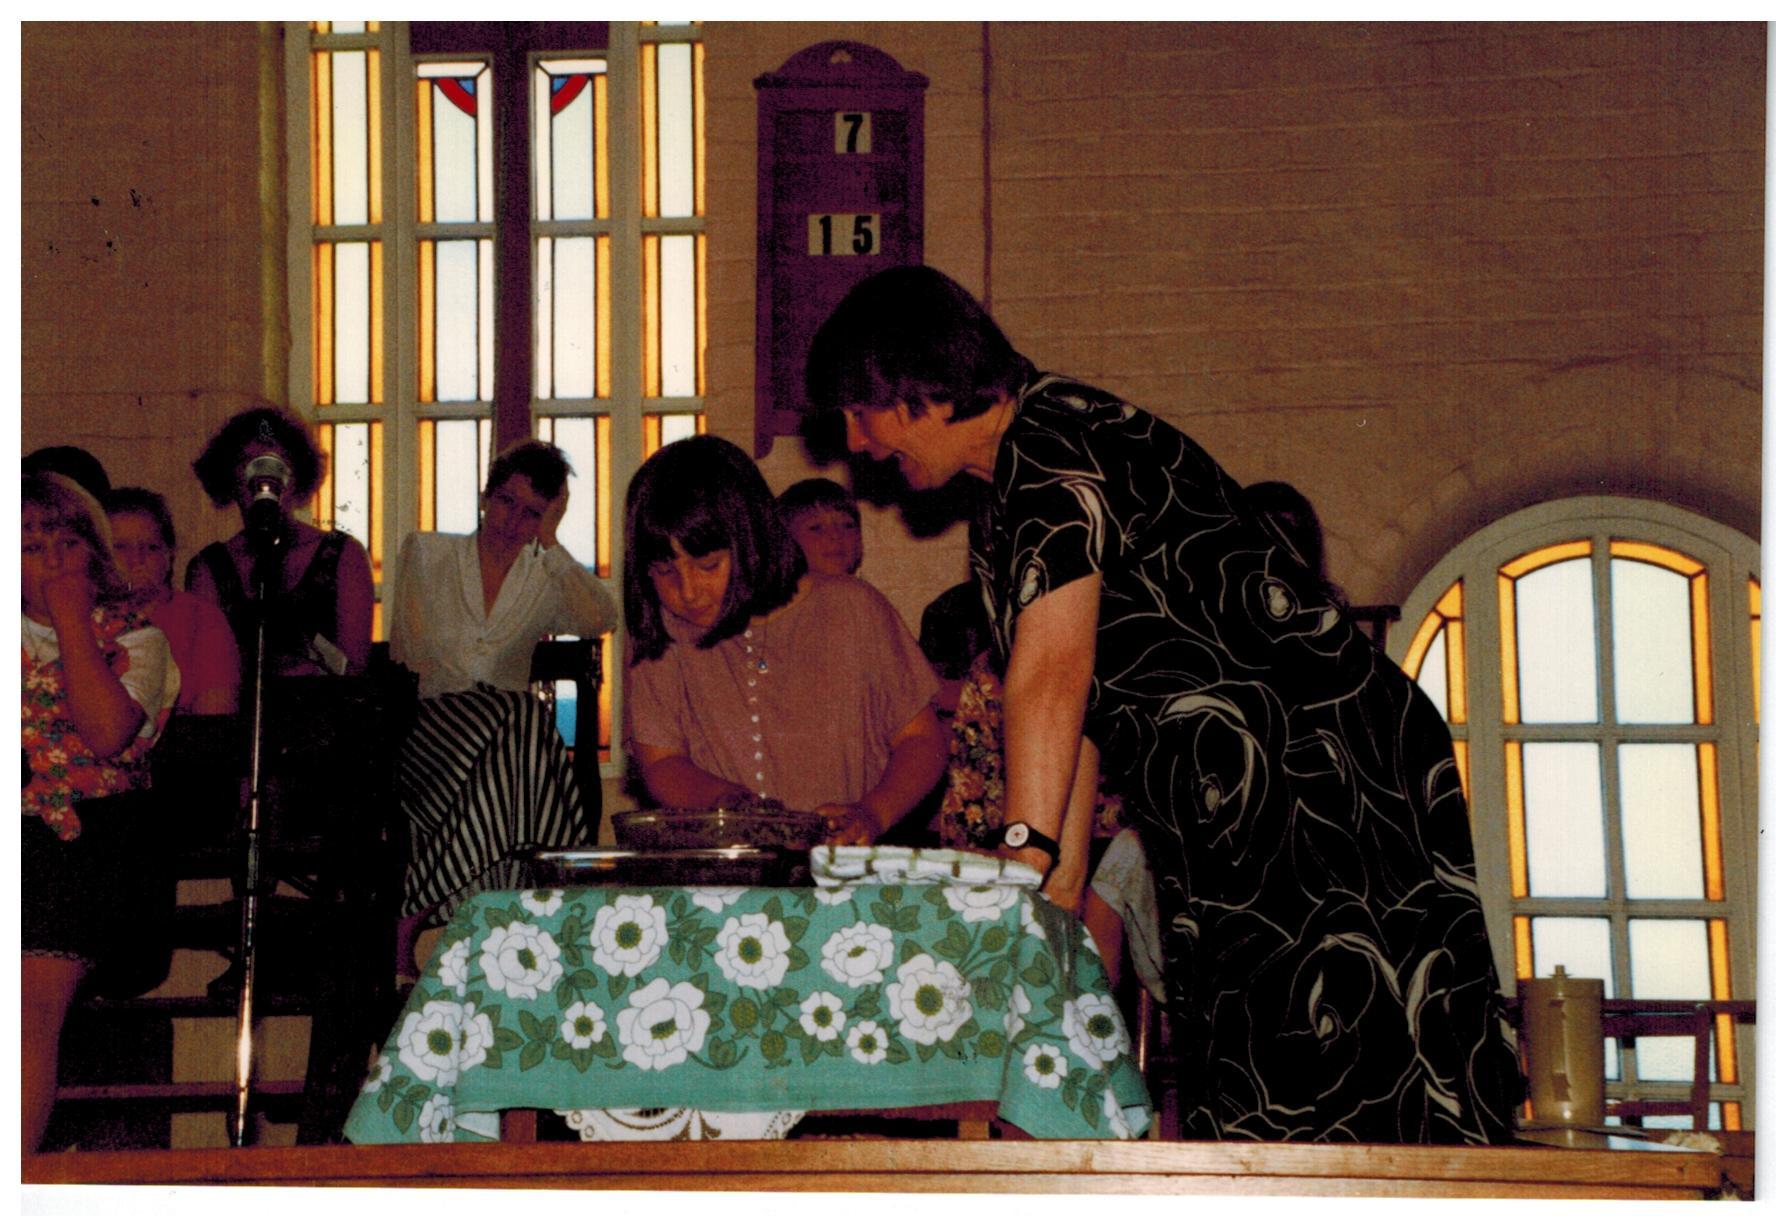 I183_Anniversay-1996